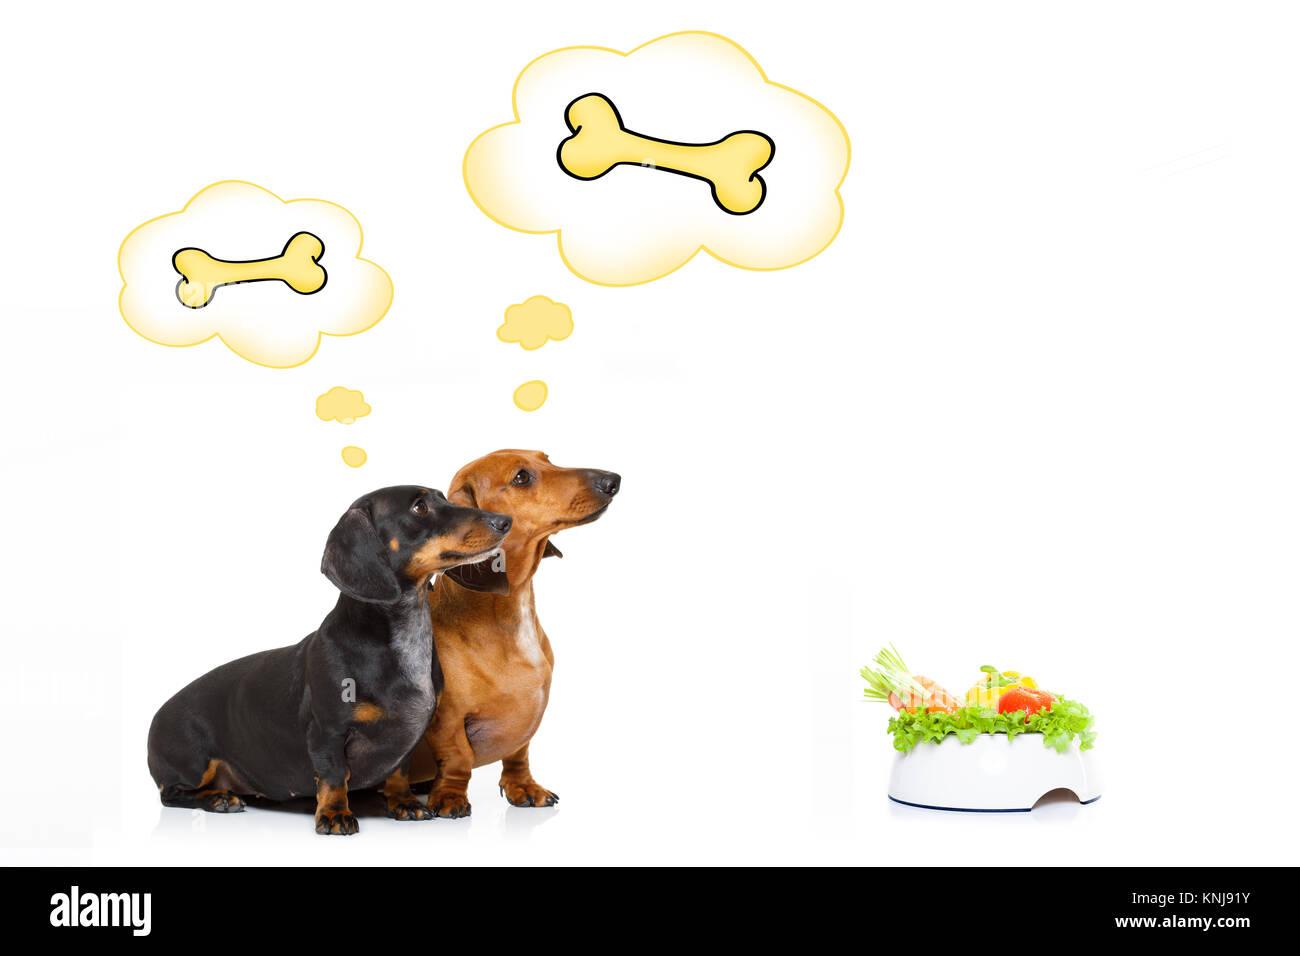 Sausage Dogs Stock Photos & Sausage Dogs Stock Images - Alamy